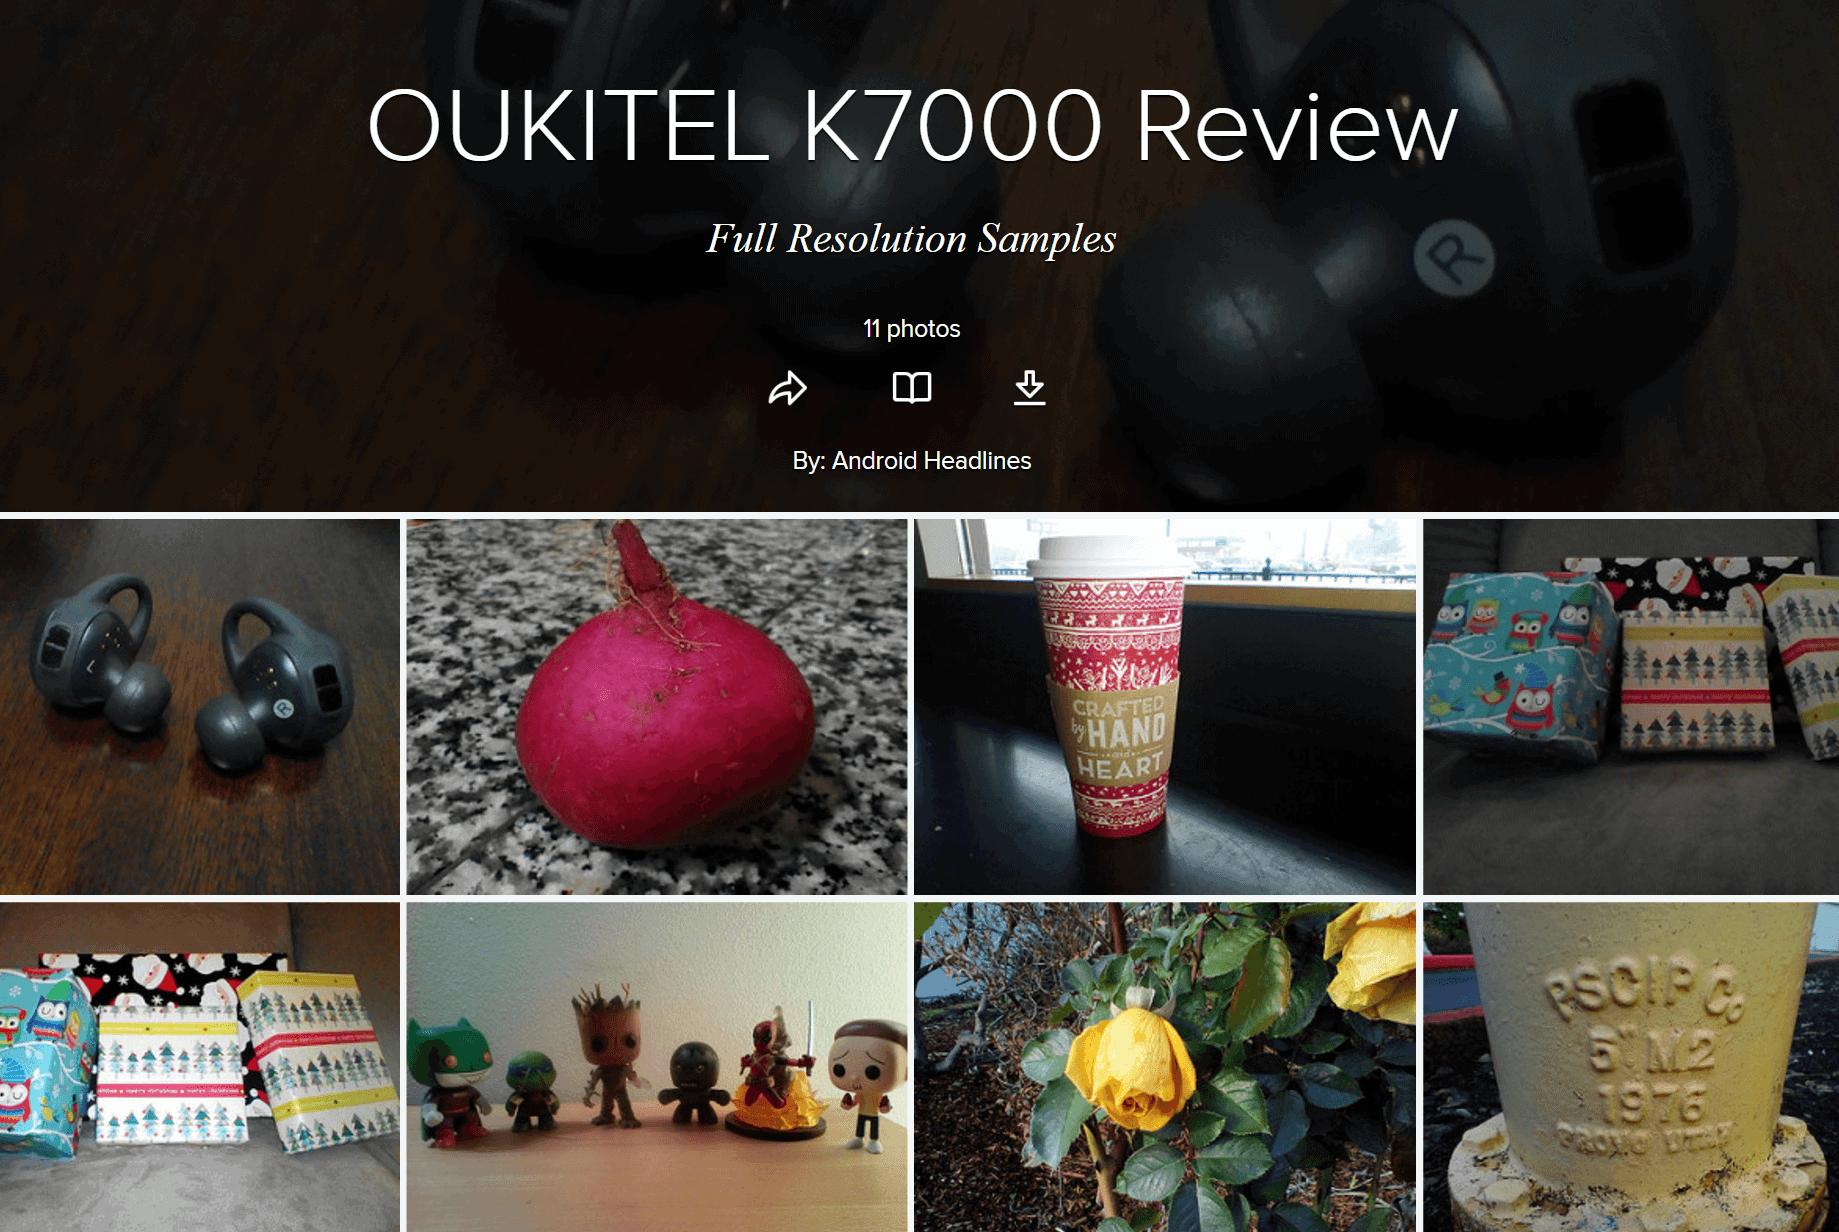 OUKITEL K7000 Samples